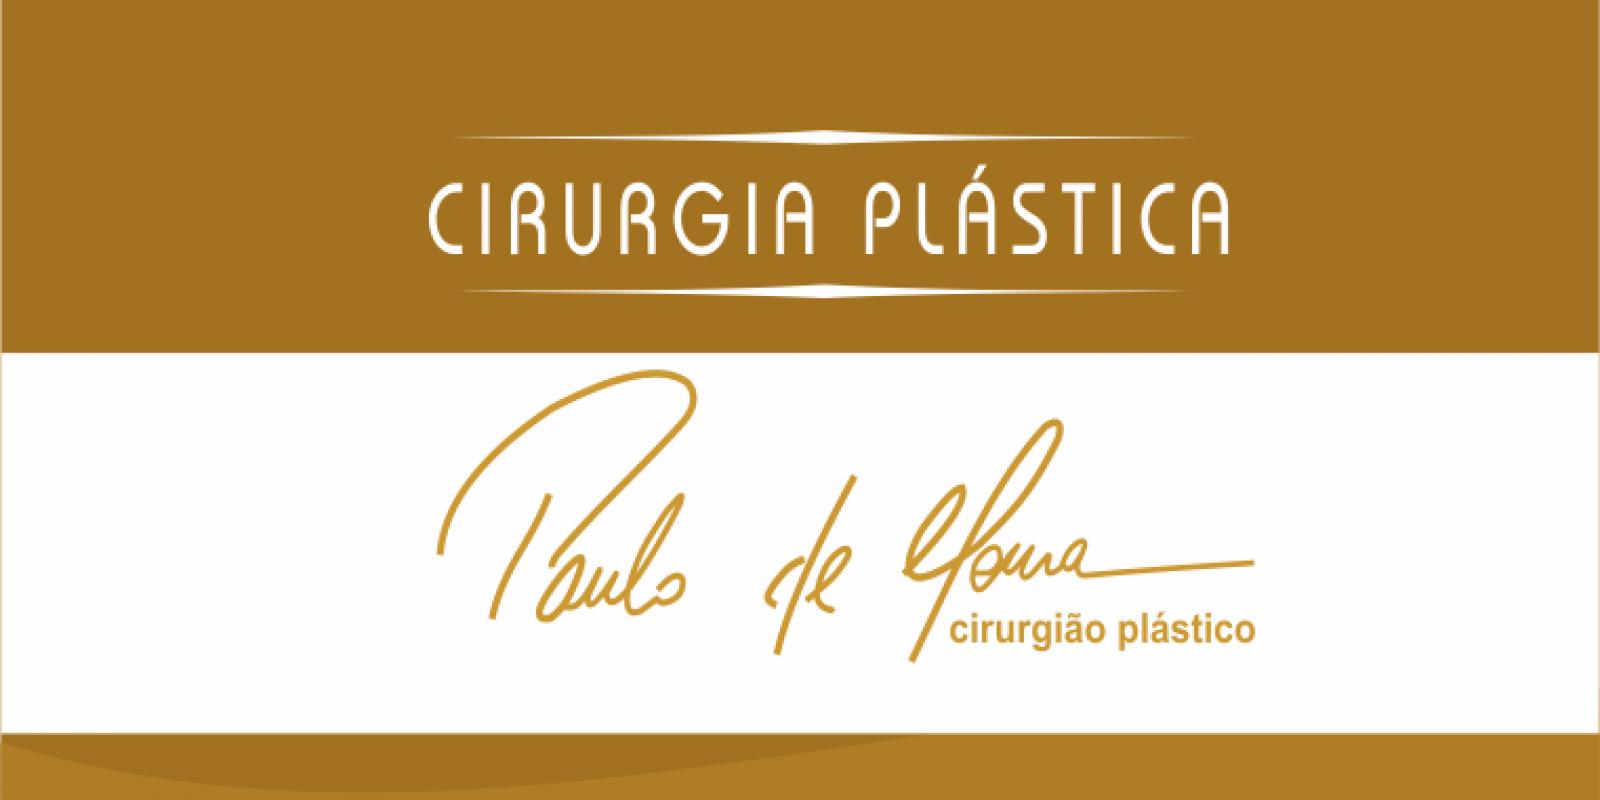 Clínica Paulo de Moura - Cirurgia Plástica